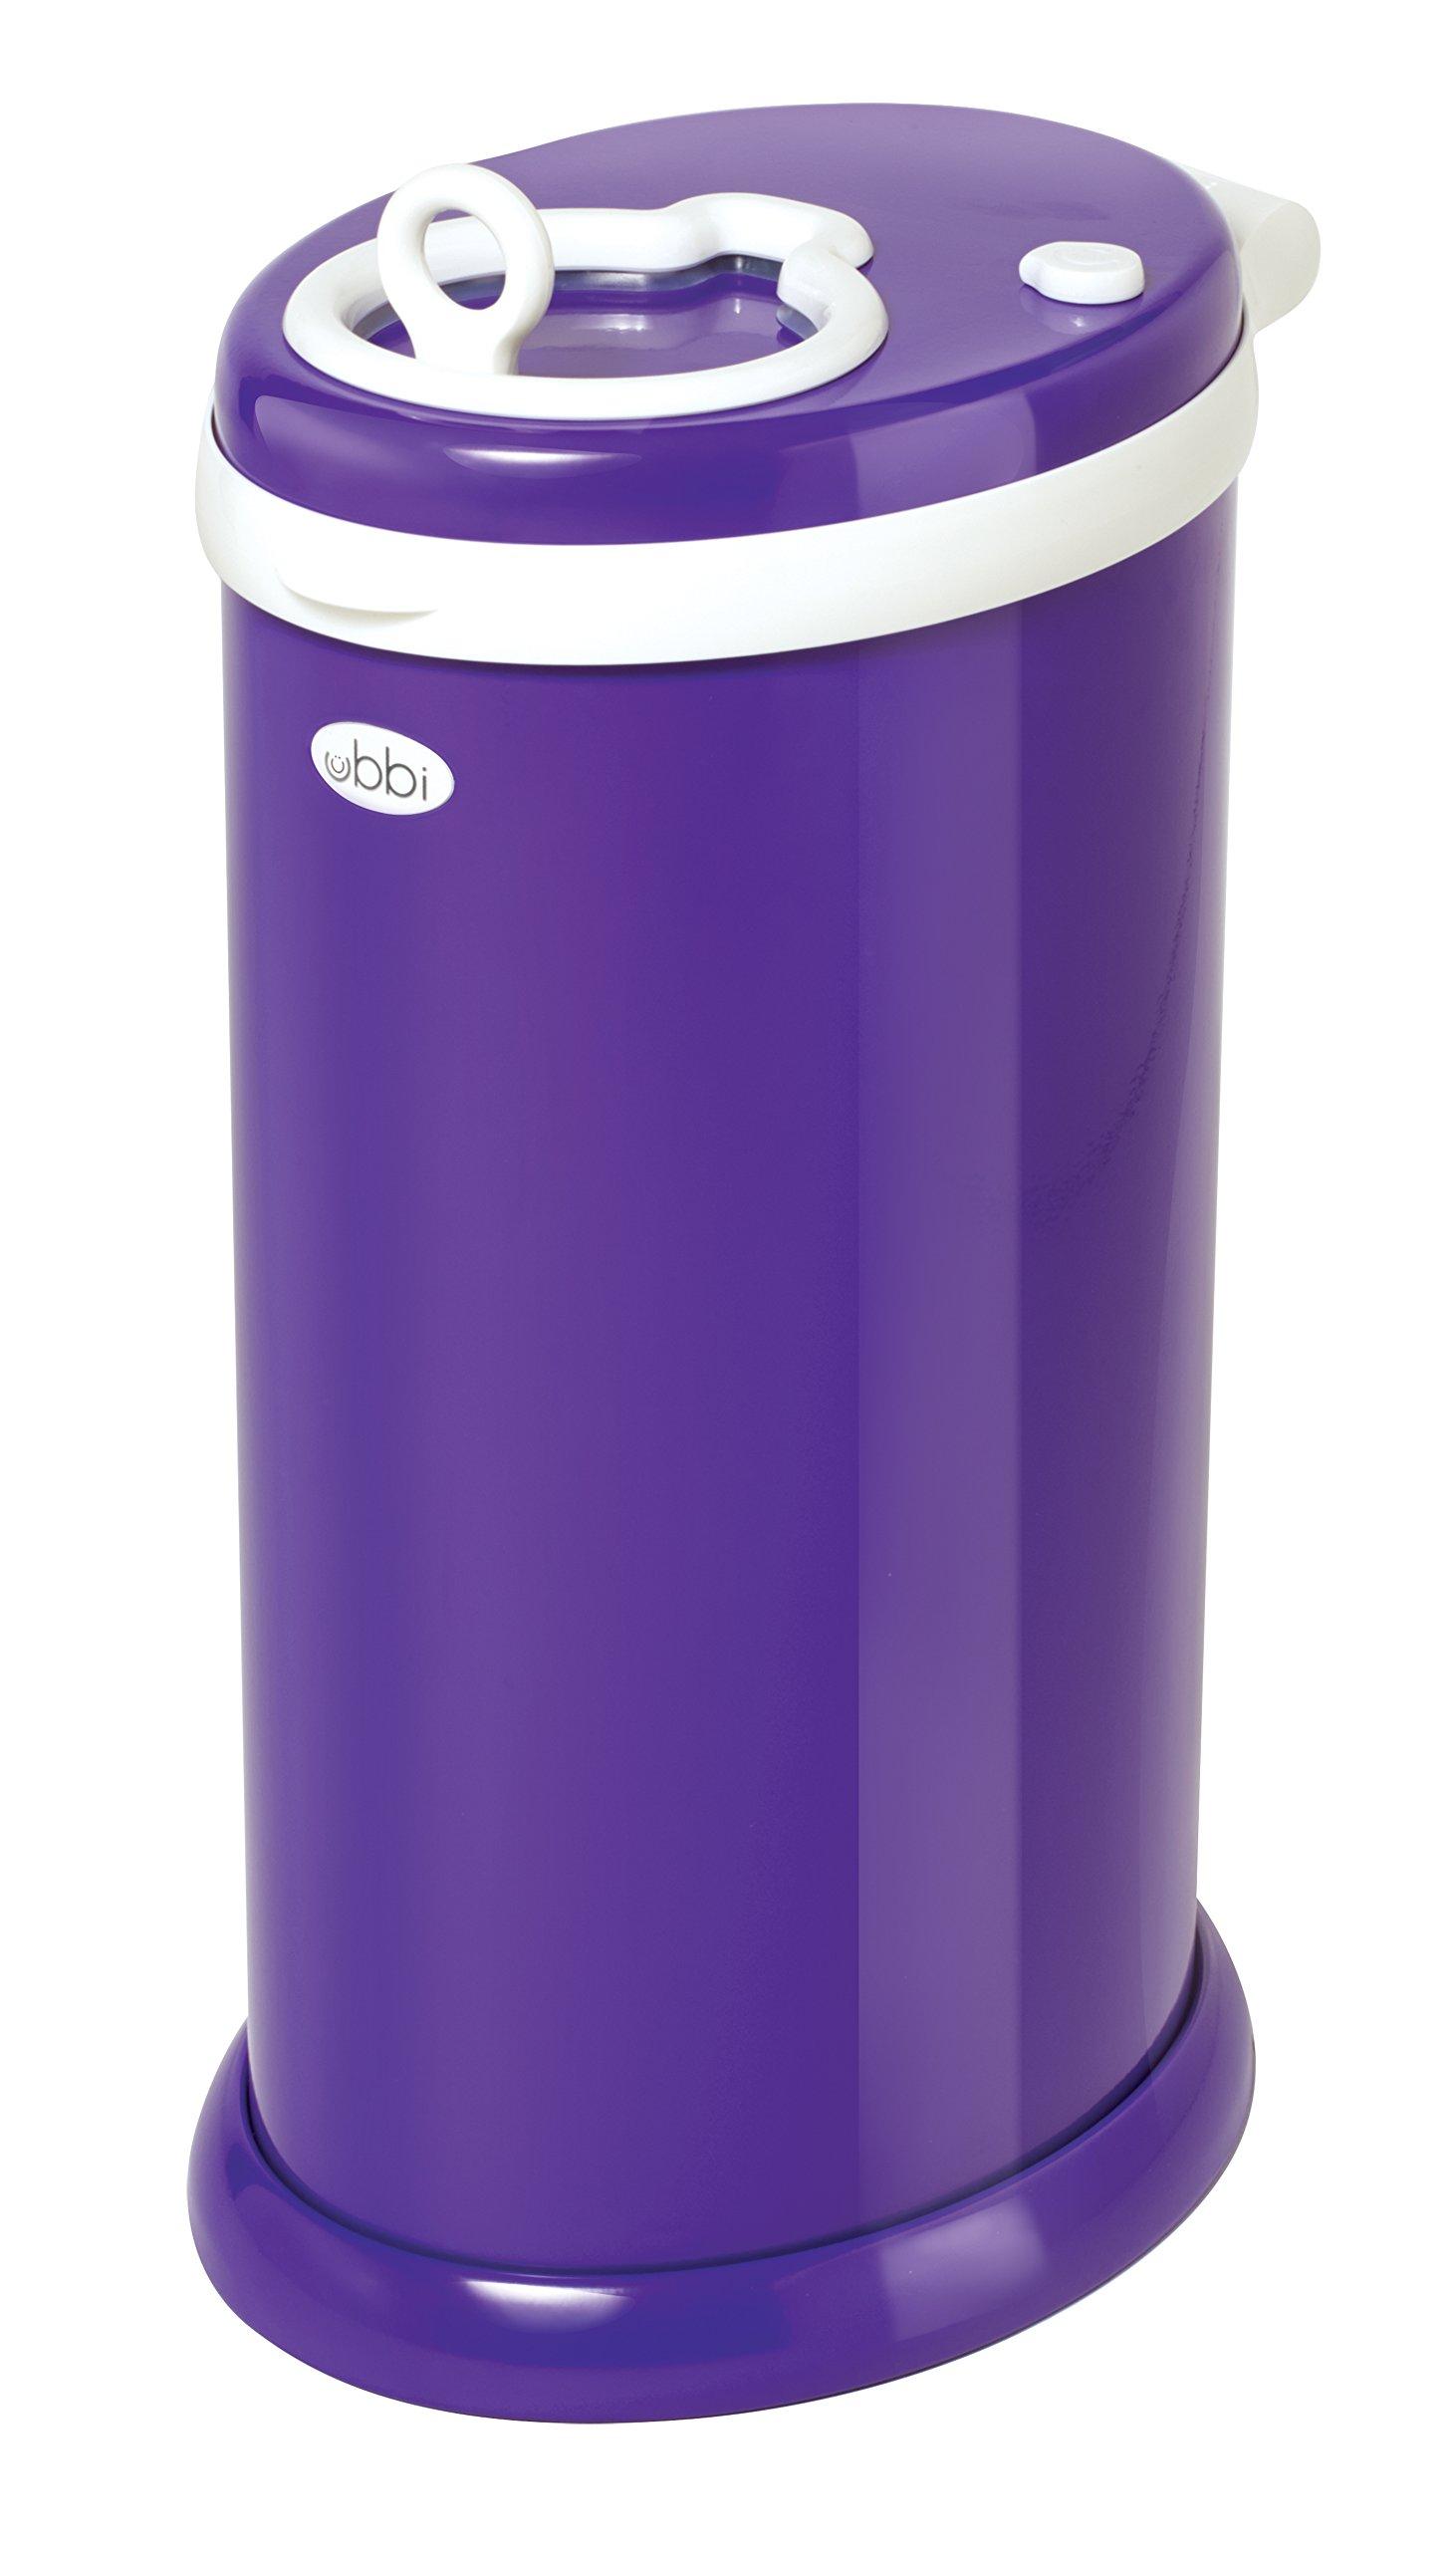 Ubbi Money Saving, No Special Bag Required, Steel Odor Locking Diaper Pail, Purple by Ubbi